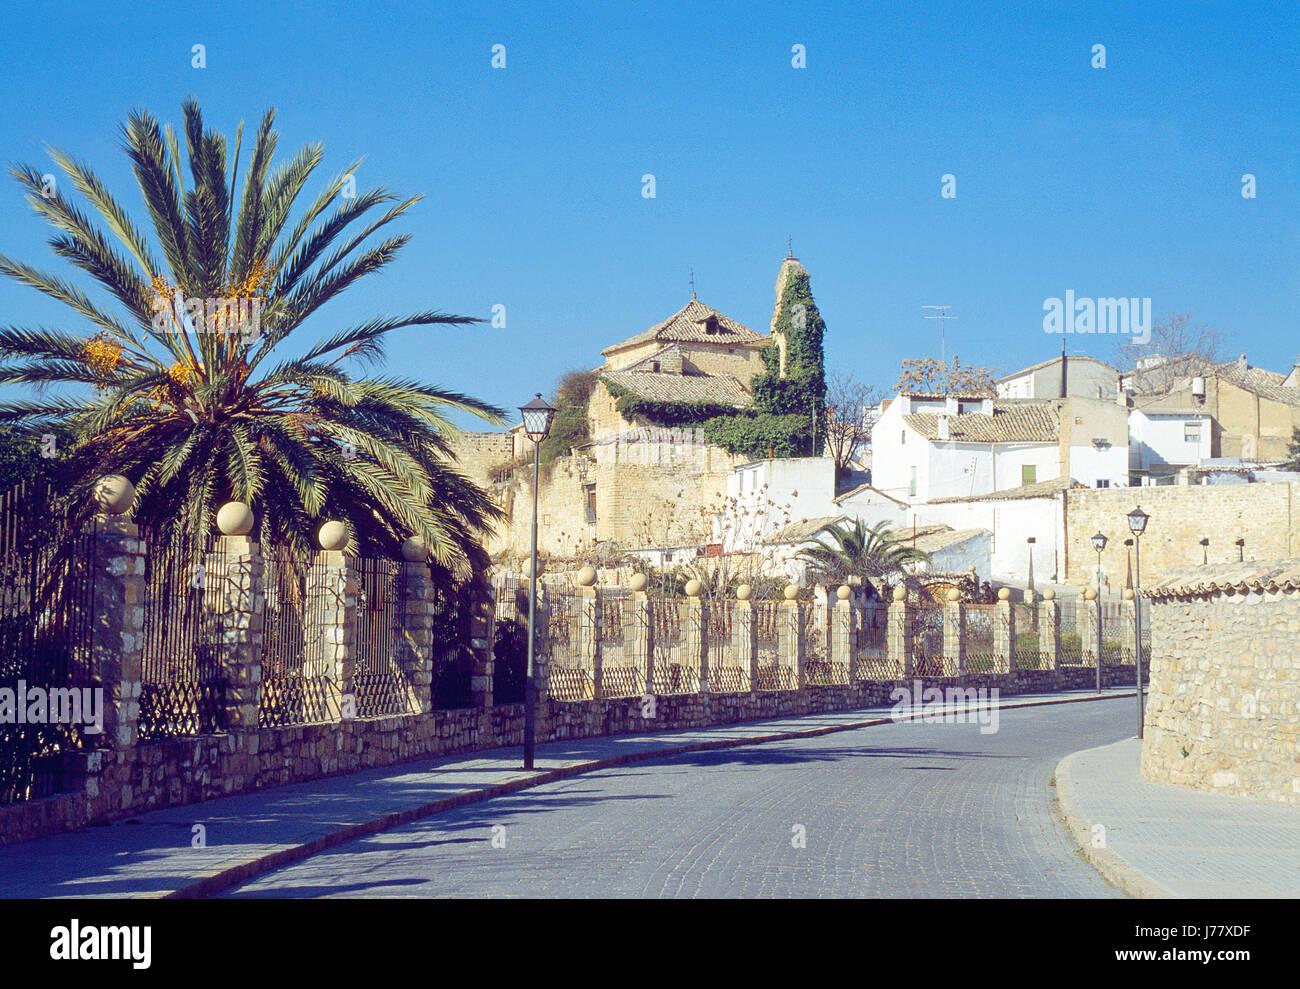 Straße. Ubeda, Provinz Jaen, Andalusien, Spanien. Stockbild